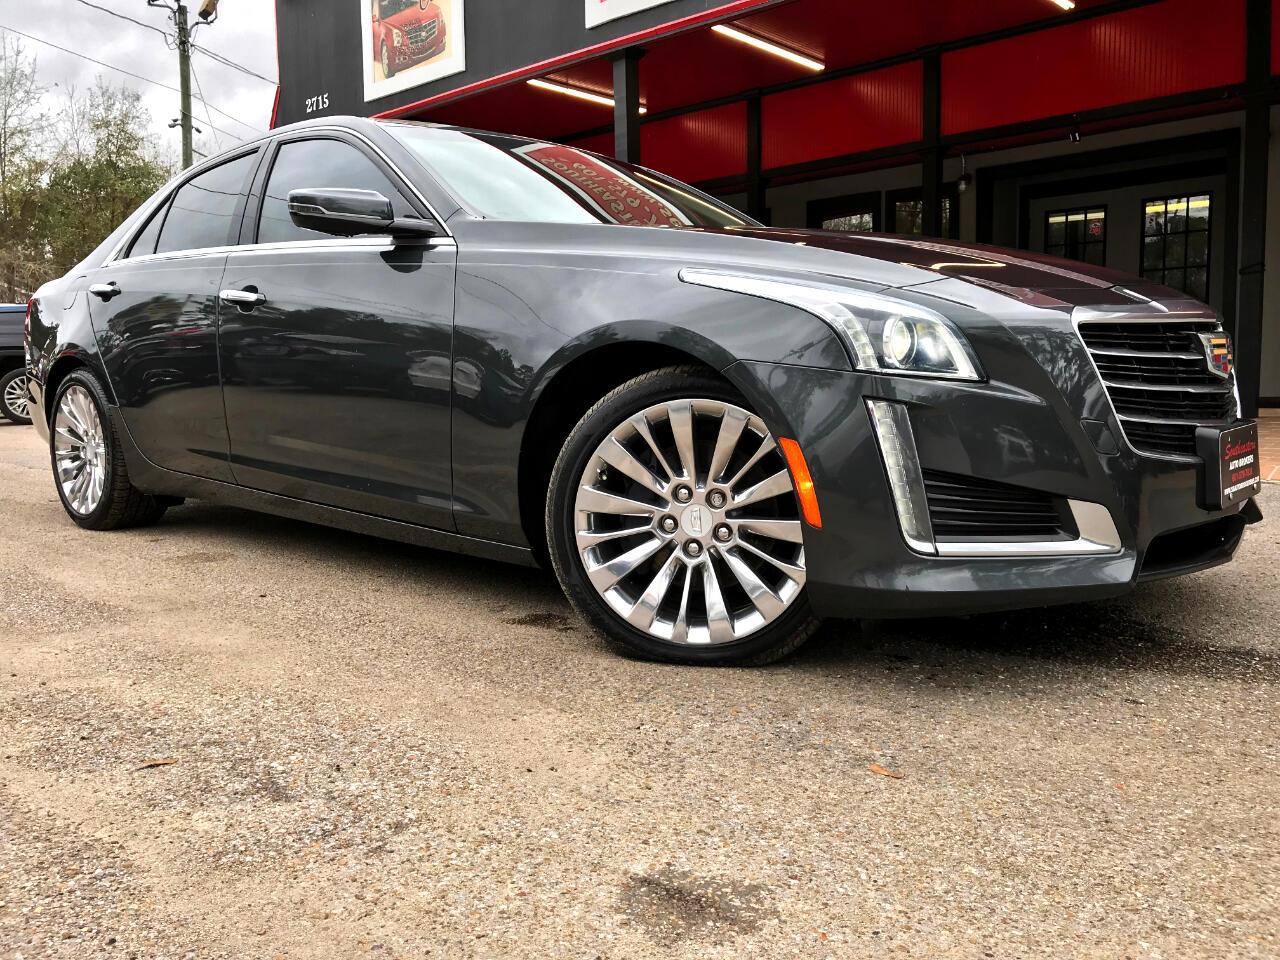 2015 Cadillac CTS 2.0L Turbo Luxury RWD